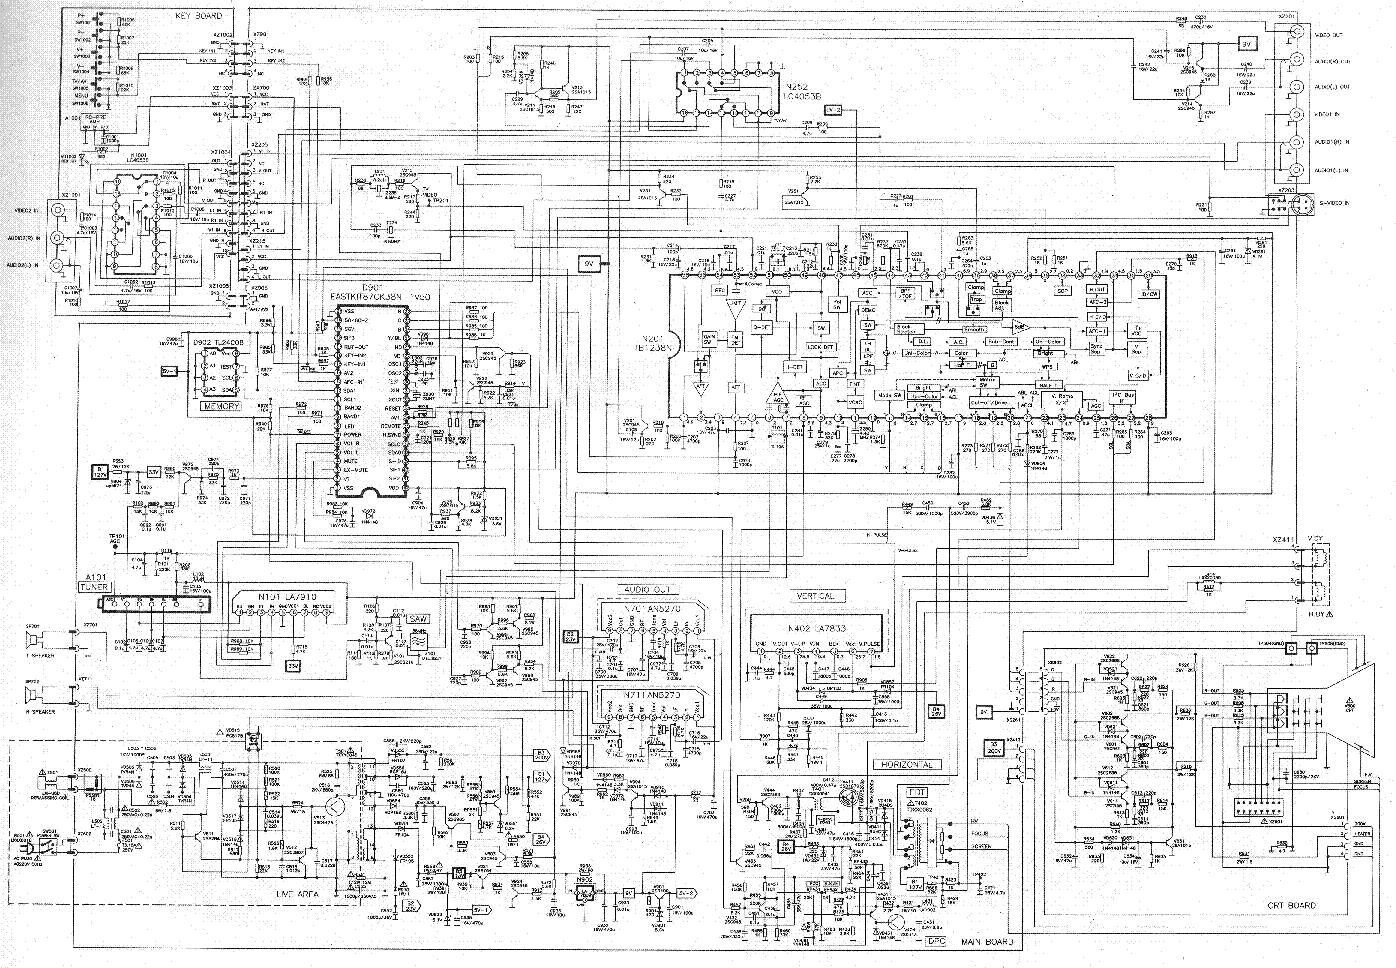 china chassis ss2 lc863528a xxxx la76810al sch service manual download  schematics  eeprom